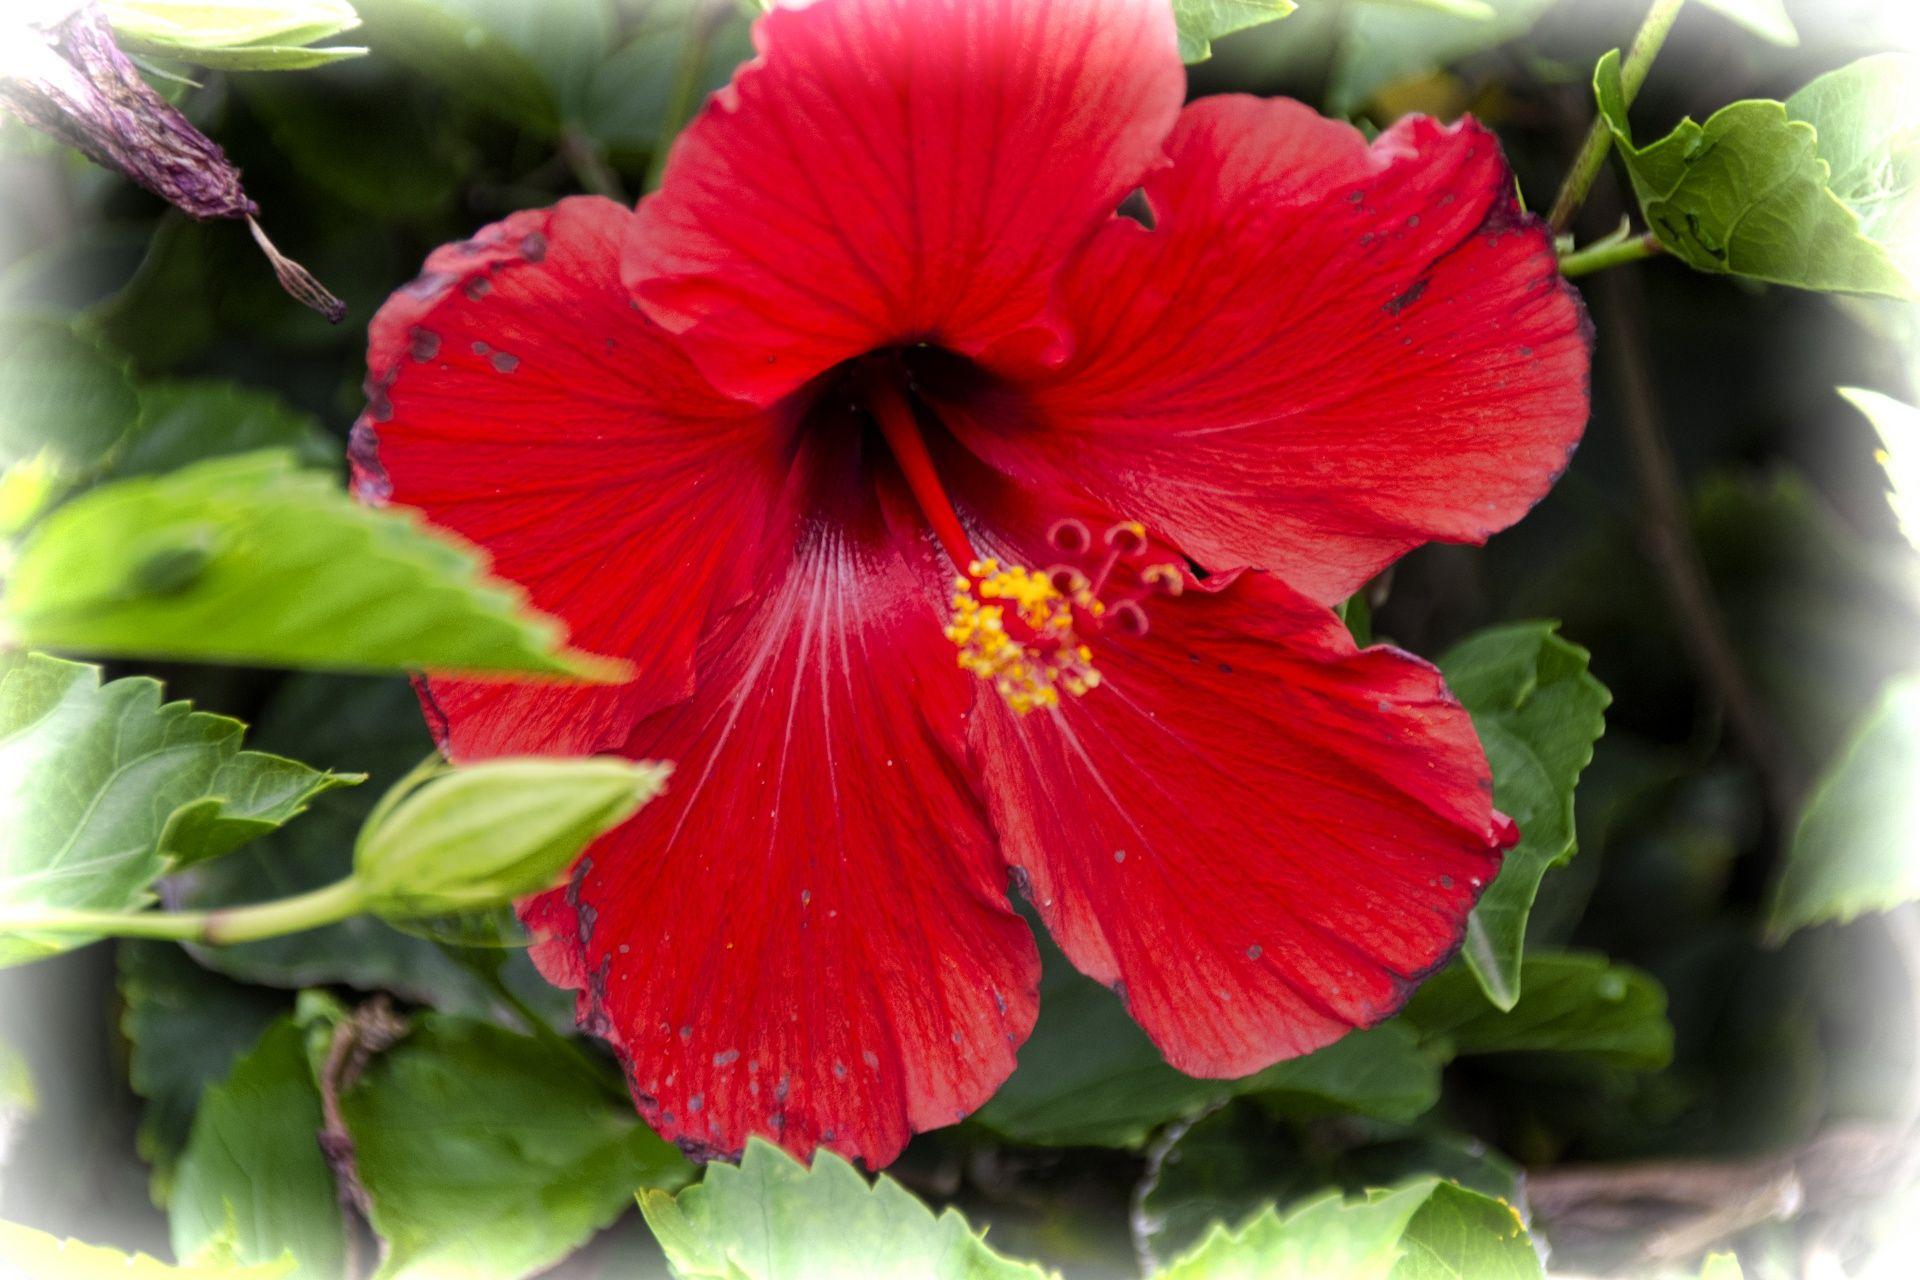 Red Hibiscus Flower Hibiscus Flowers Flowers Hibiscus